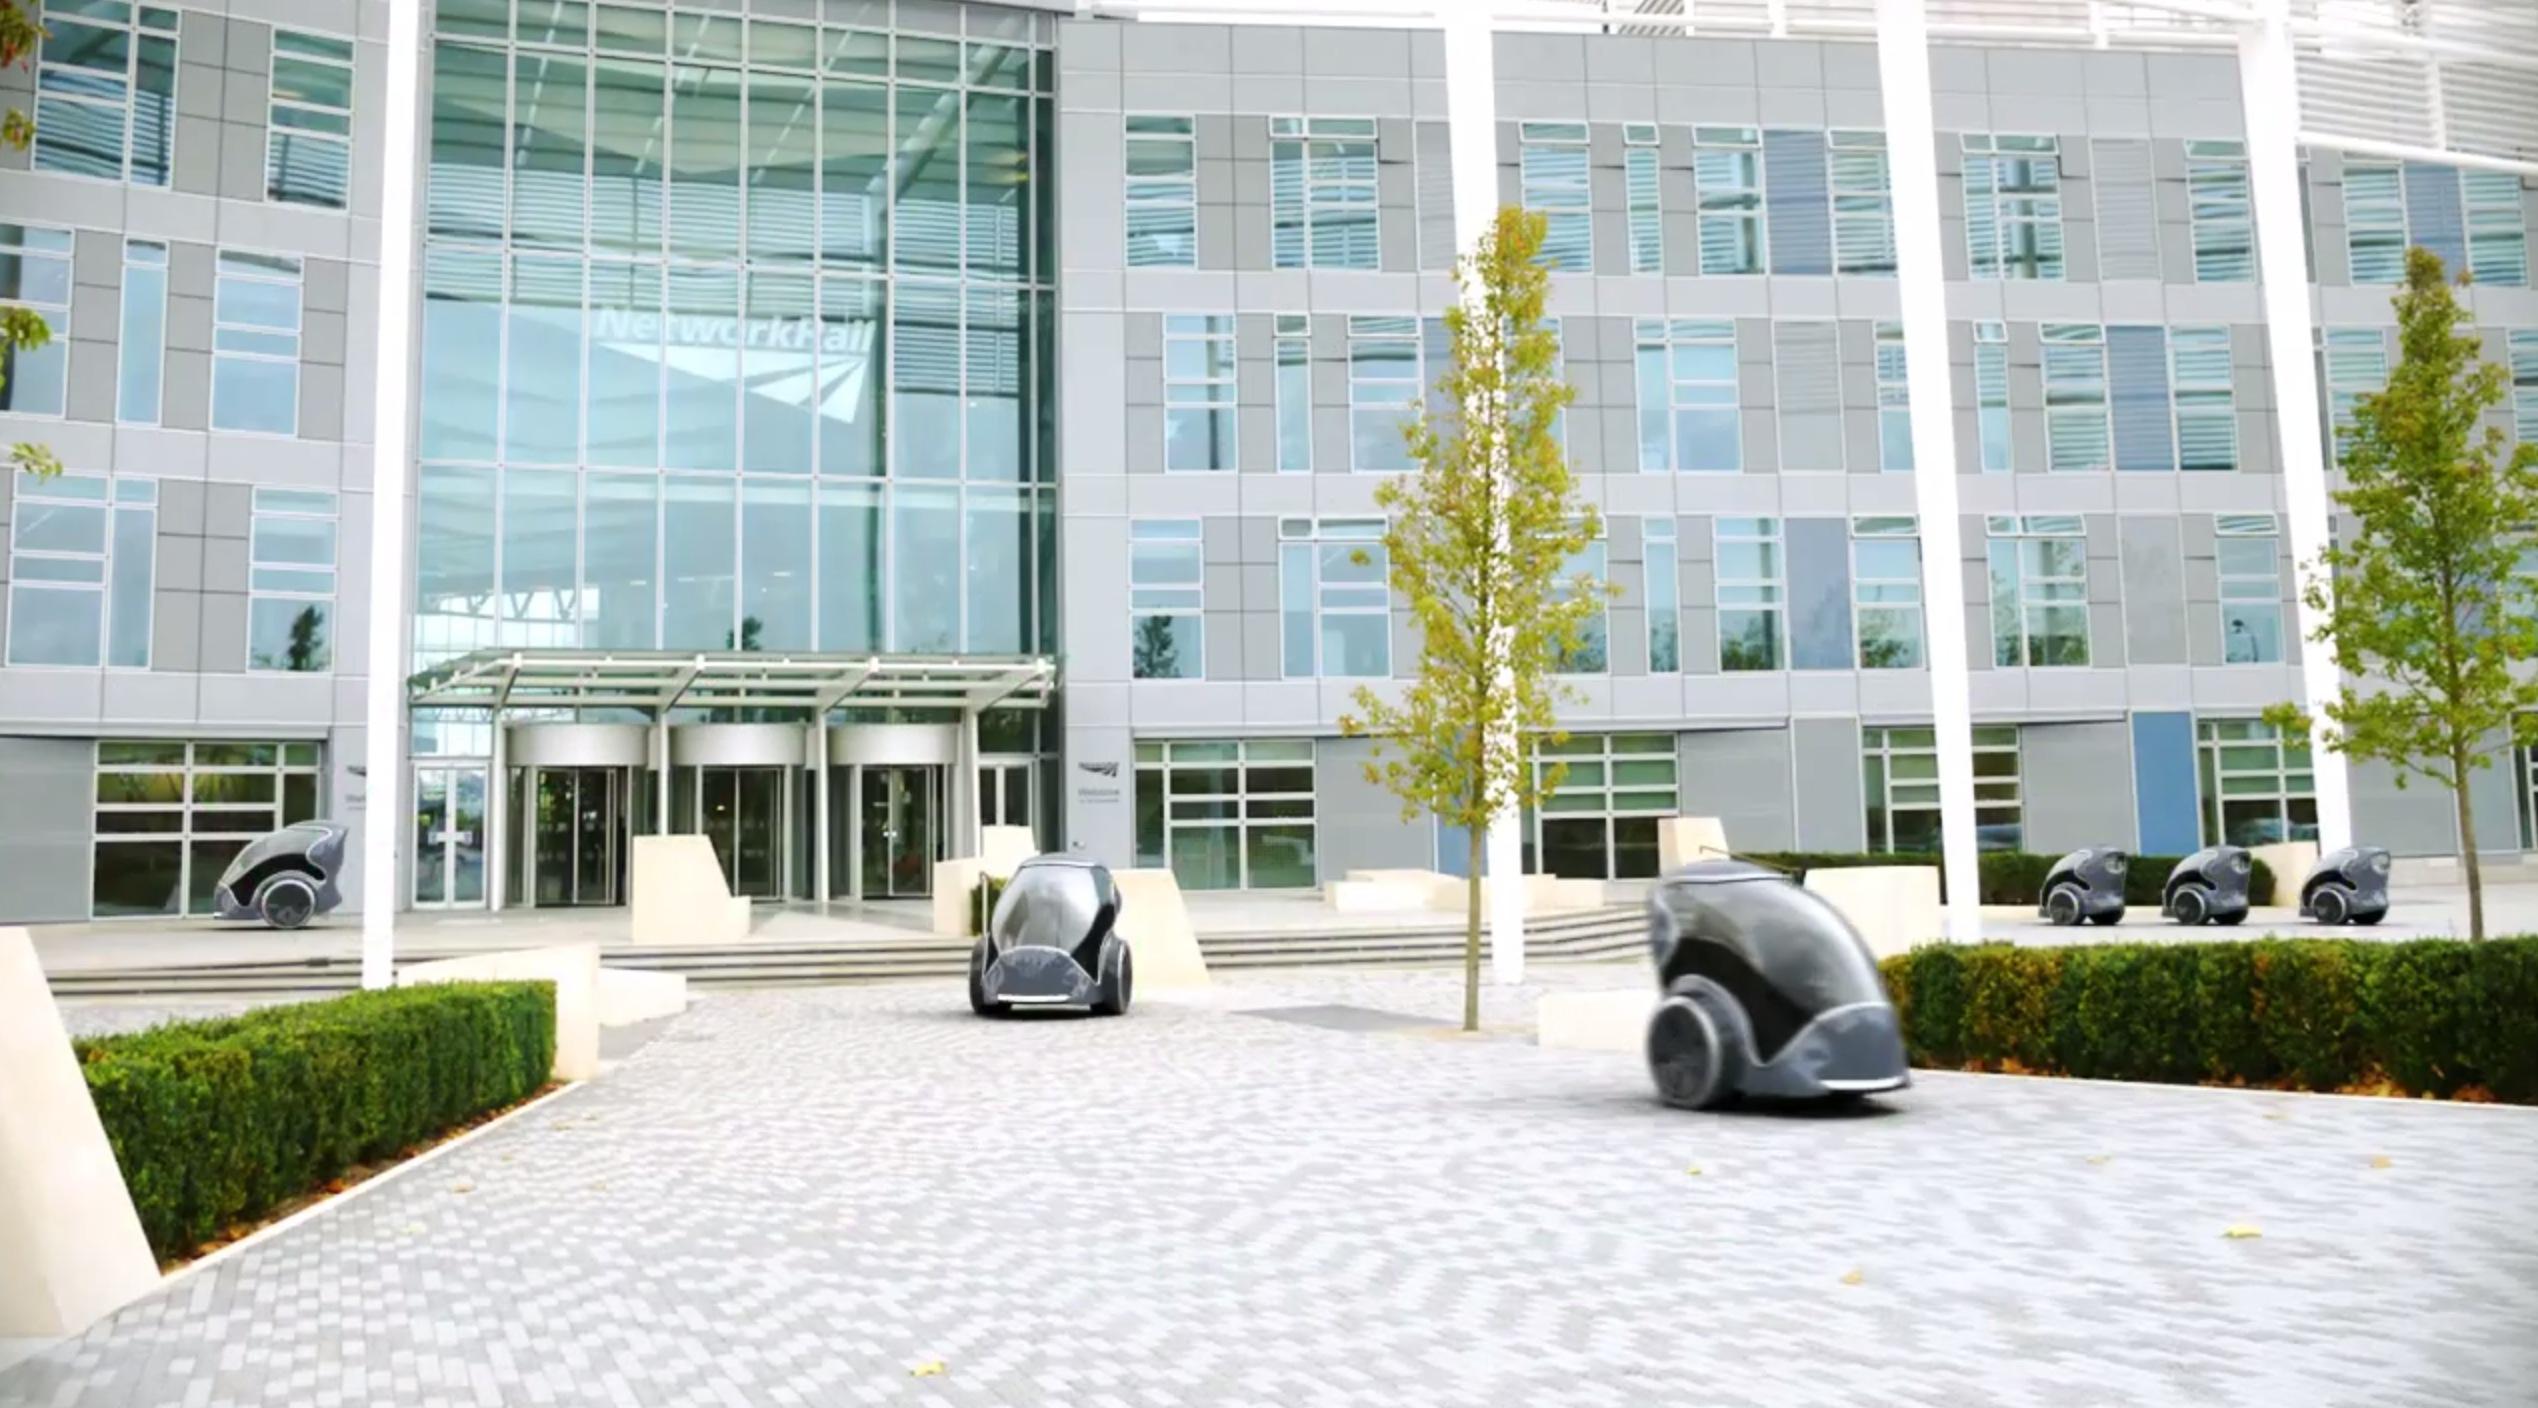 driverlesscars